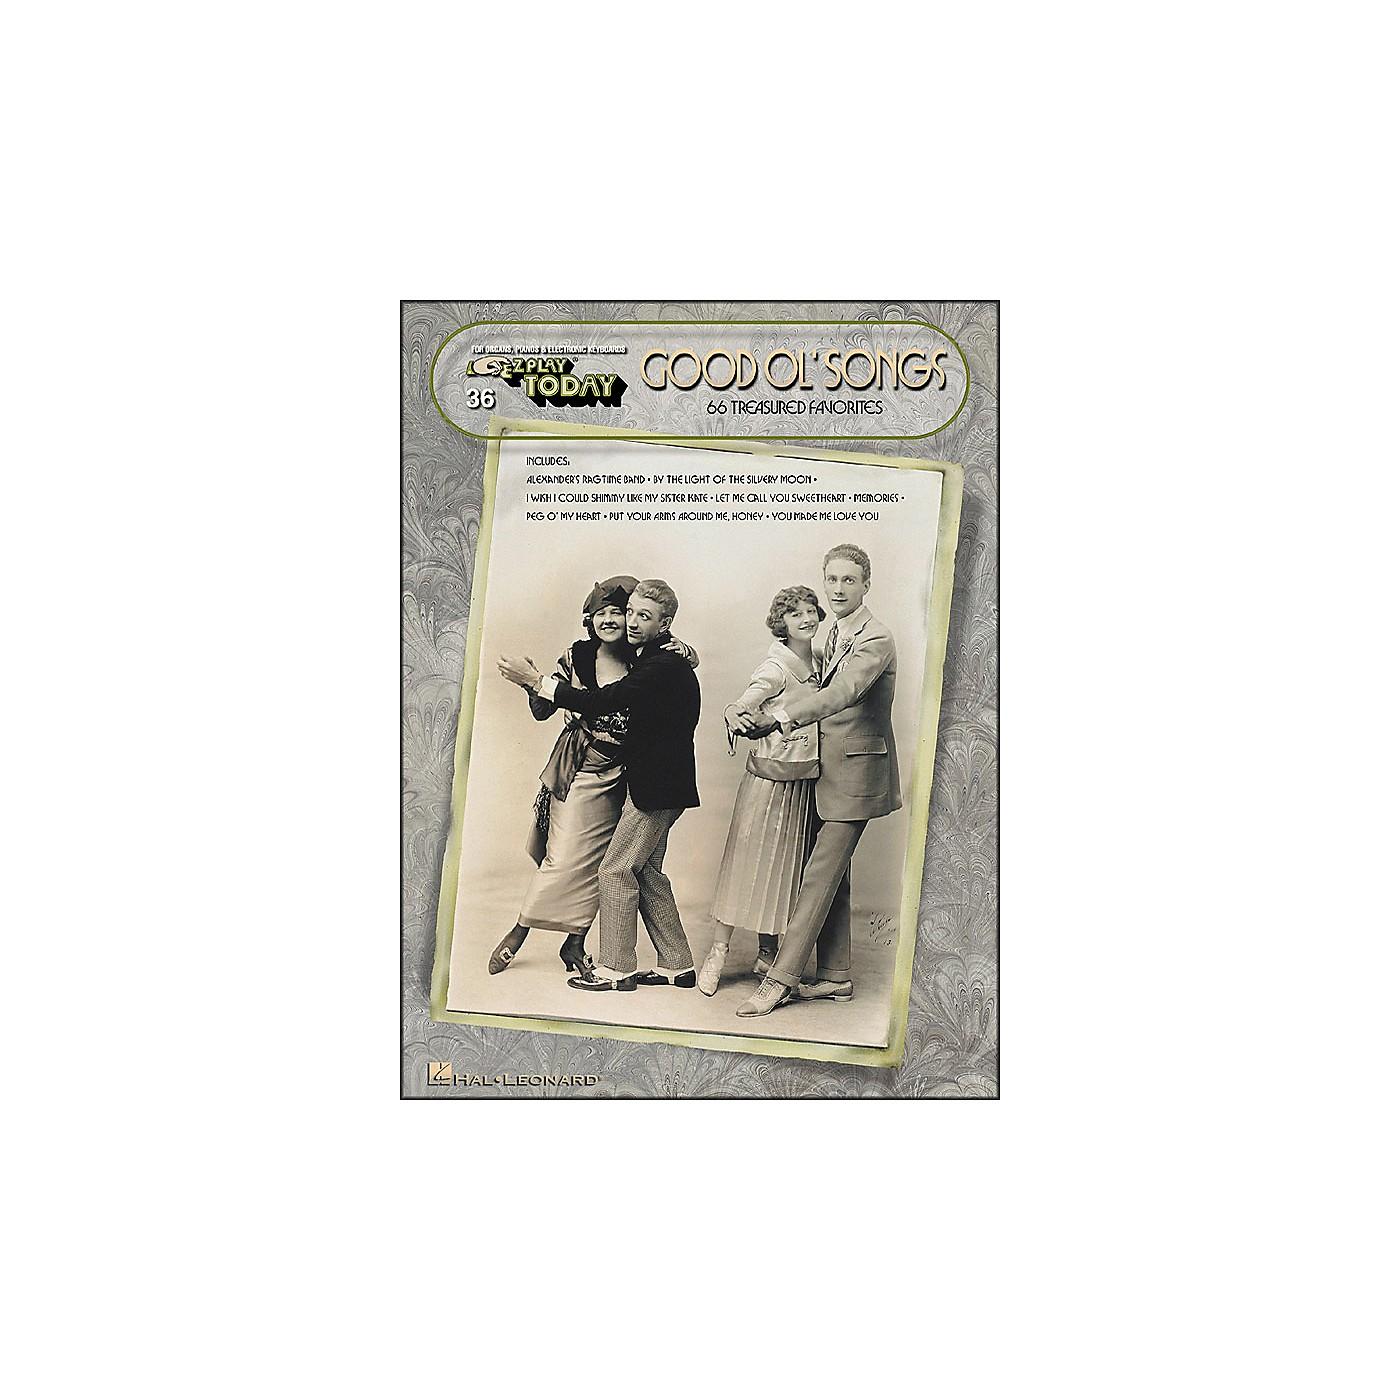 Hal Leonard Good Ol Songs (66 Treasured Favorites) E-Z Play 36 thumbnail